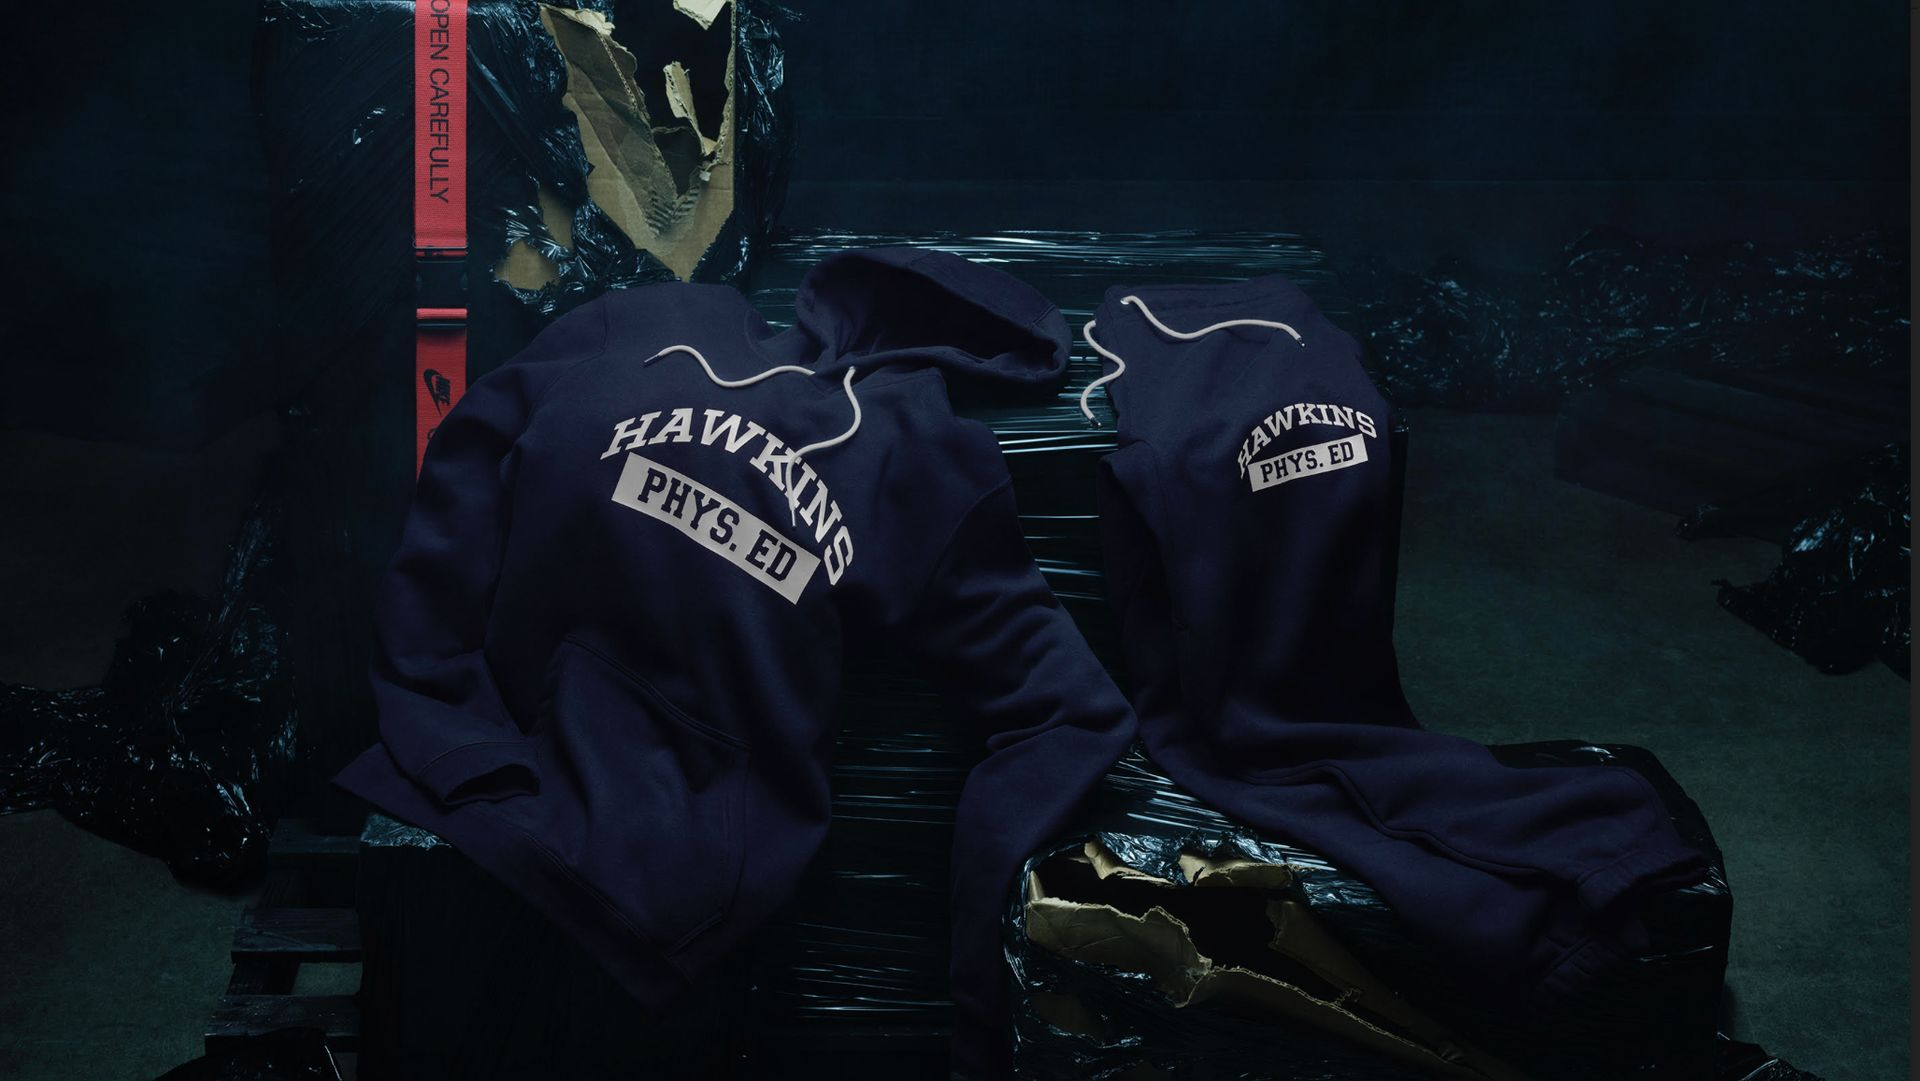 Nike x Stranger Things Apparel 'Hawkins High' Release Date